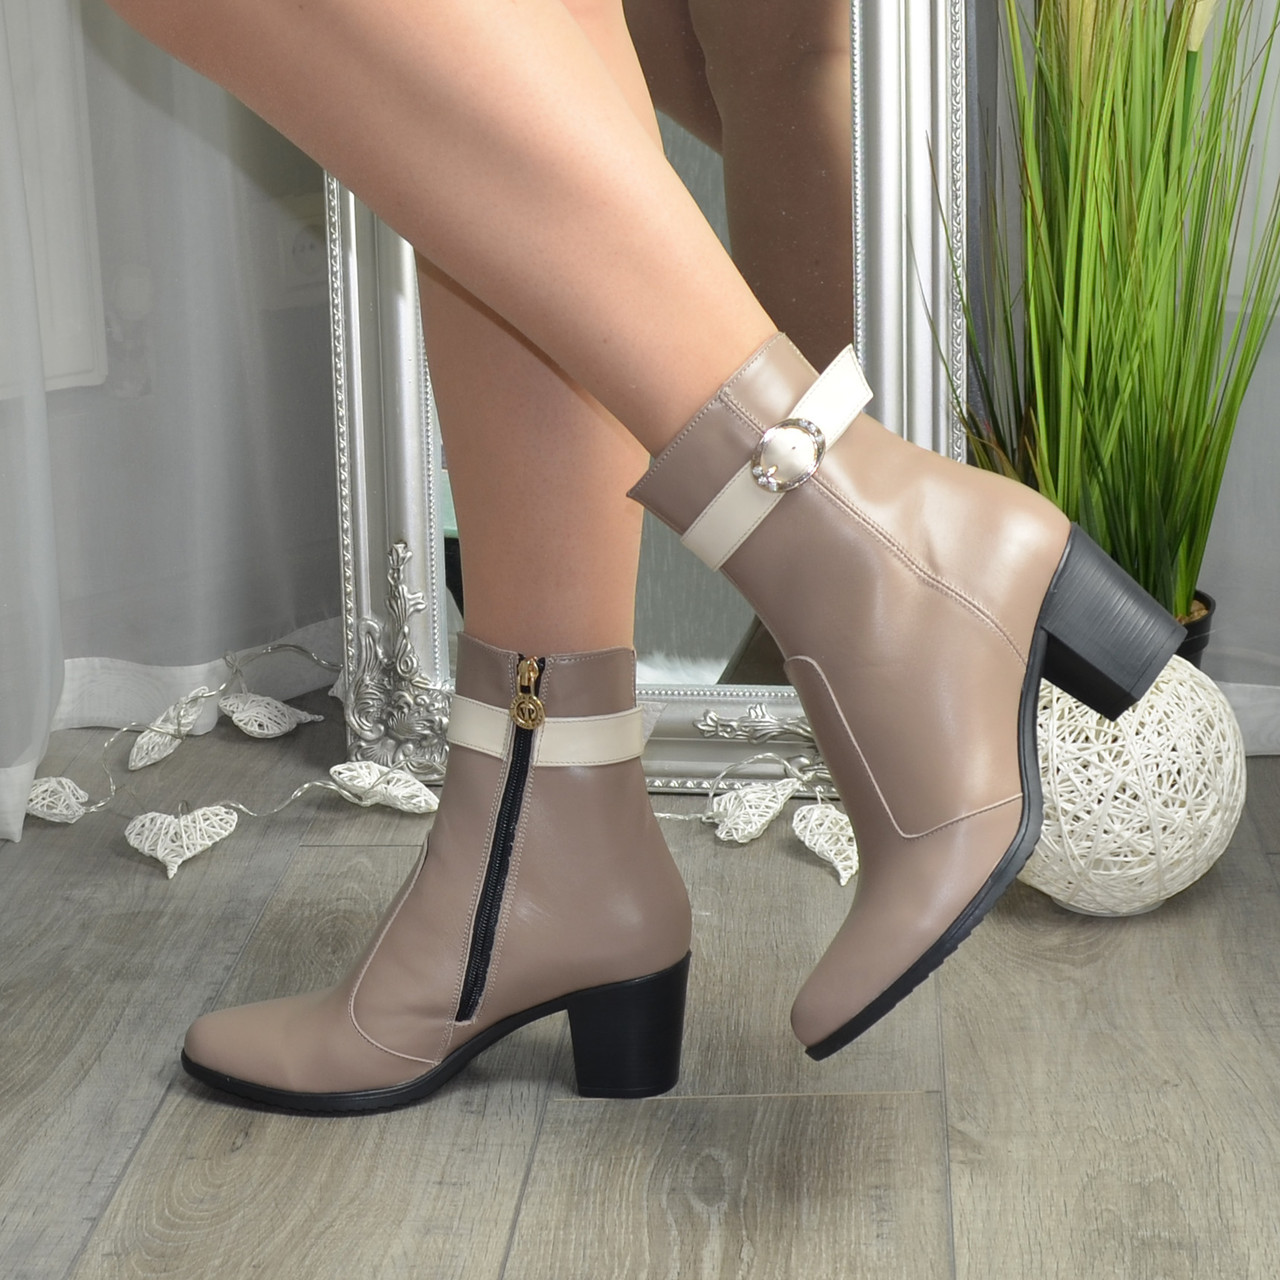 Женские кожаные ботинки на каблуке, цвет визон/беж